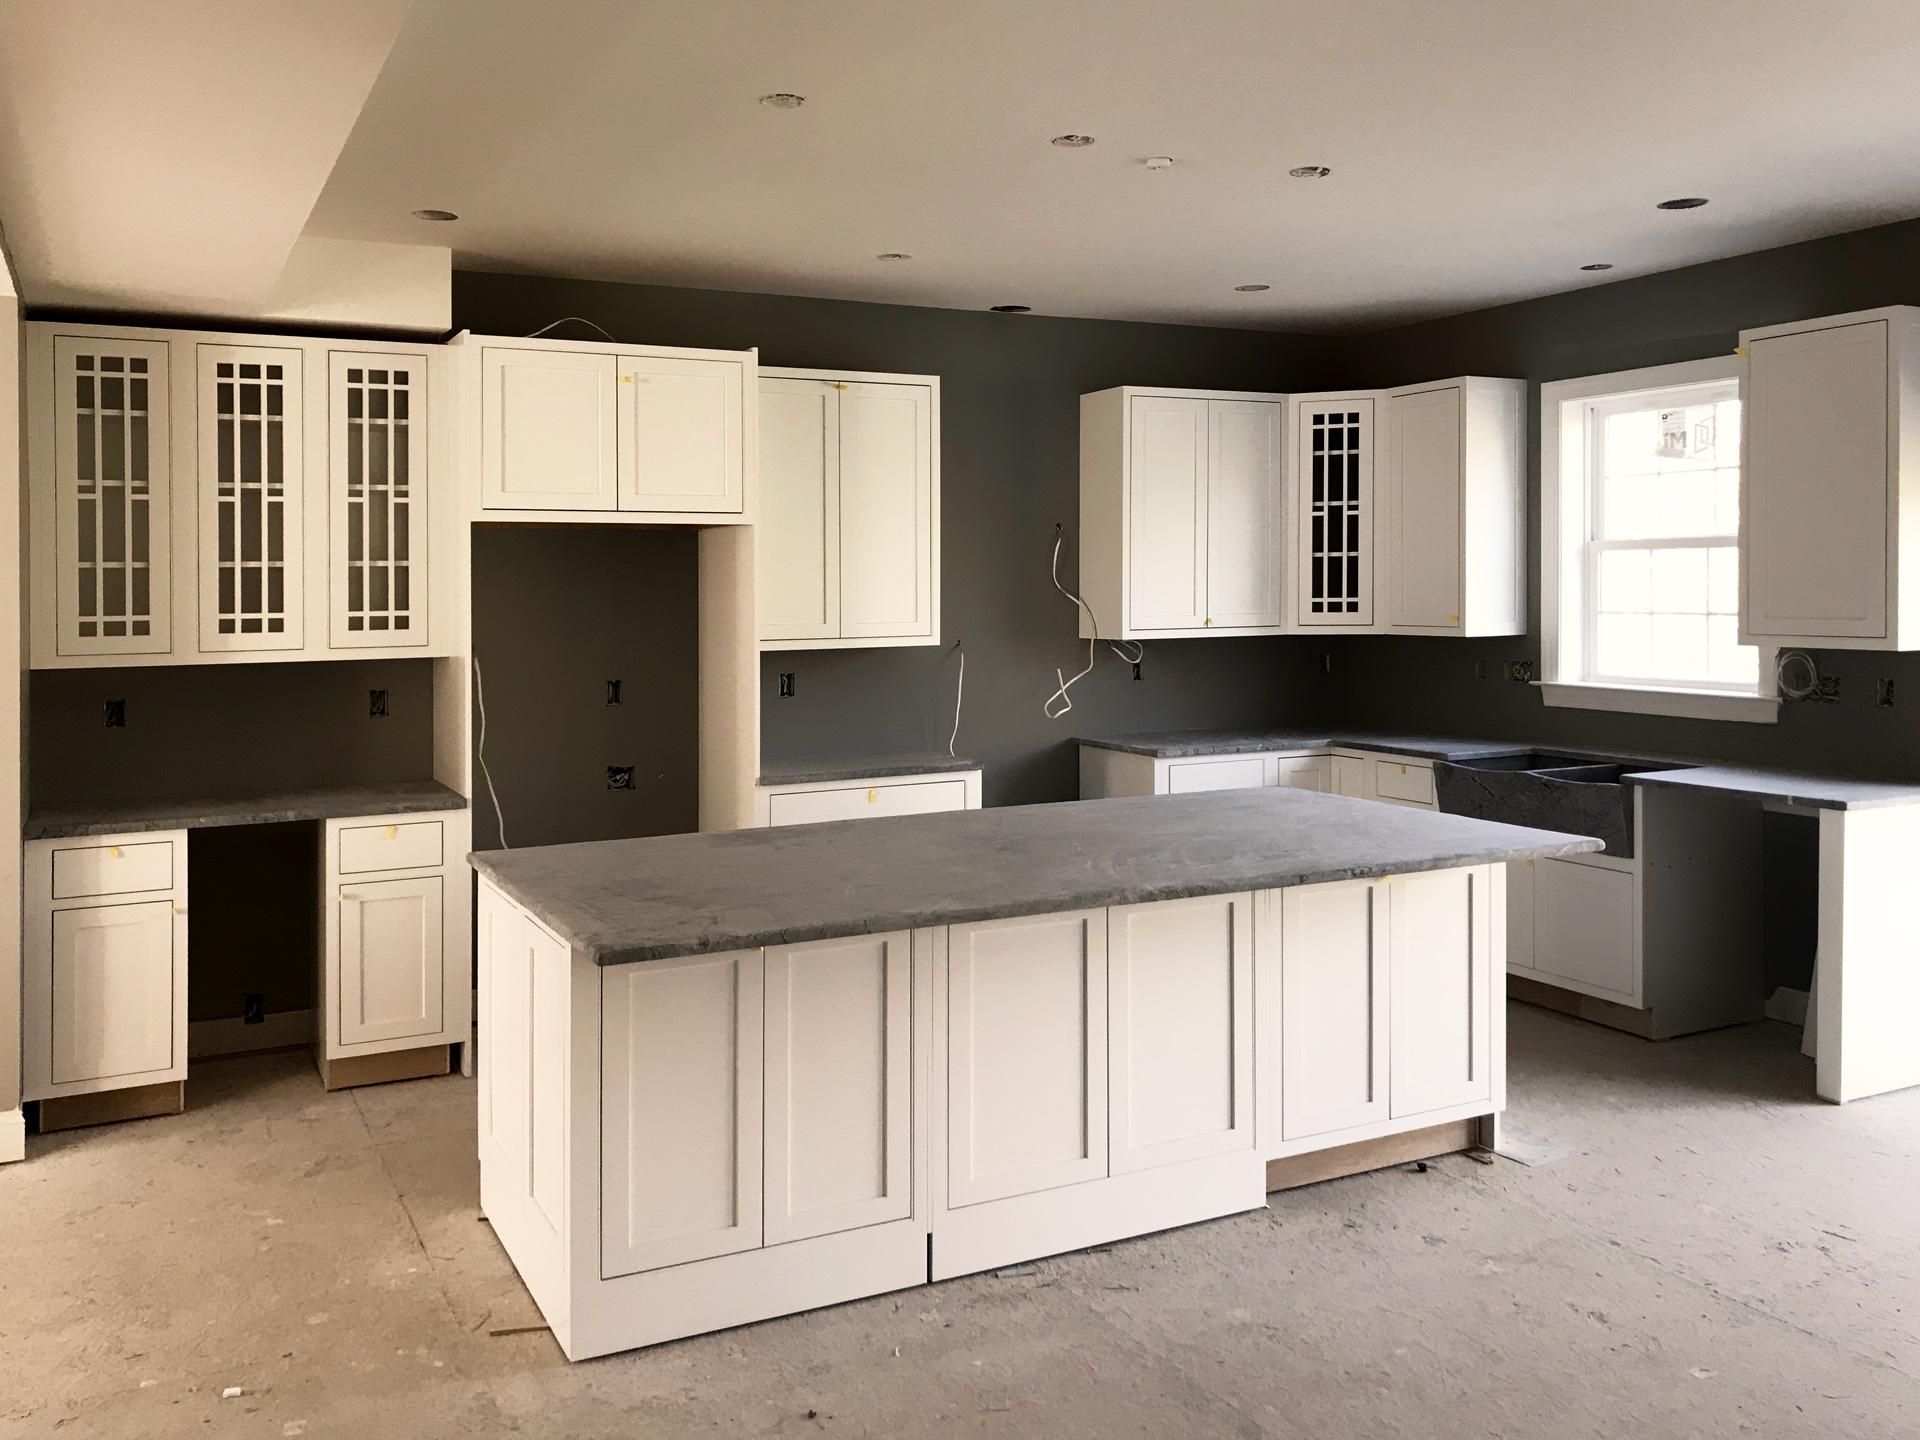 New Construction Kitchen